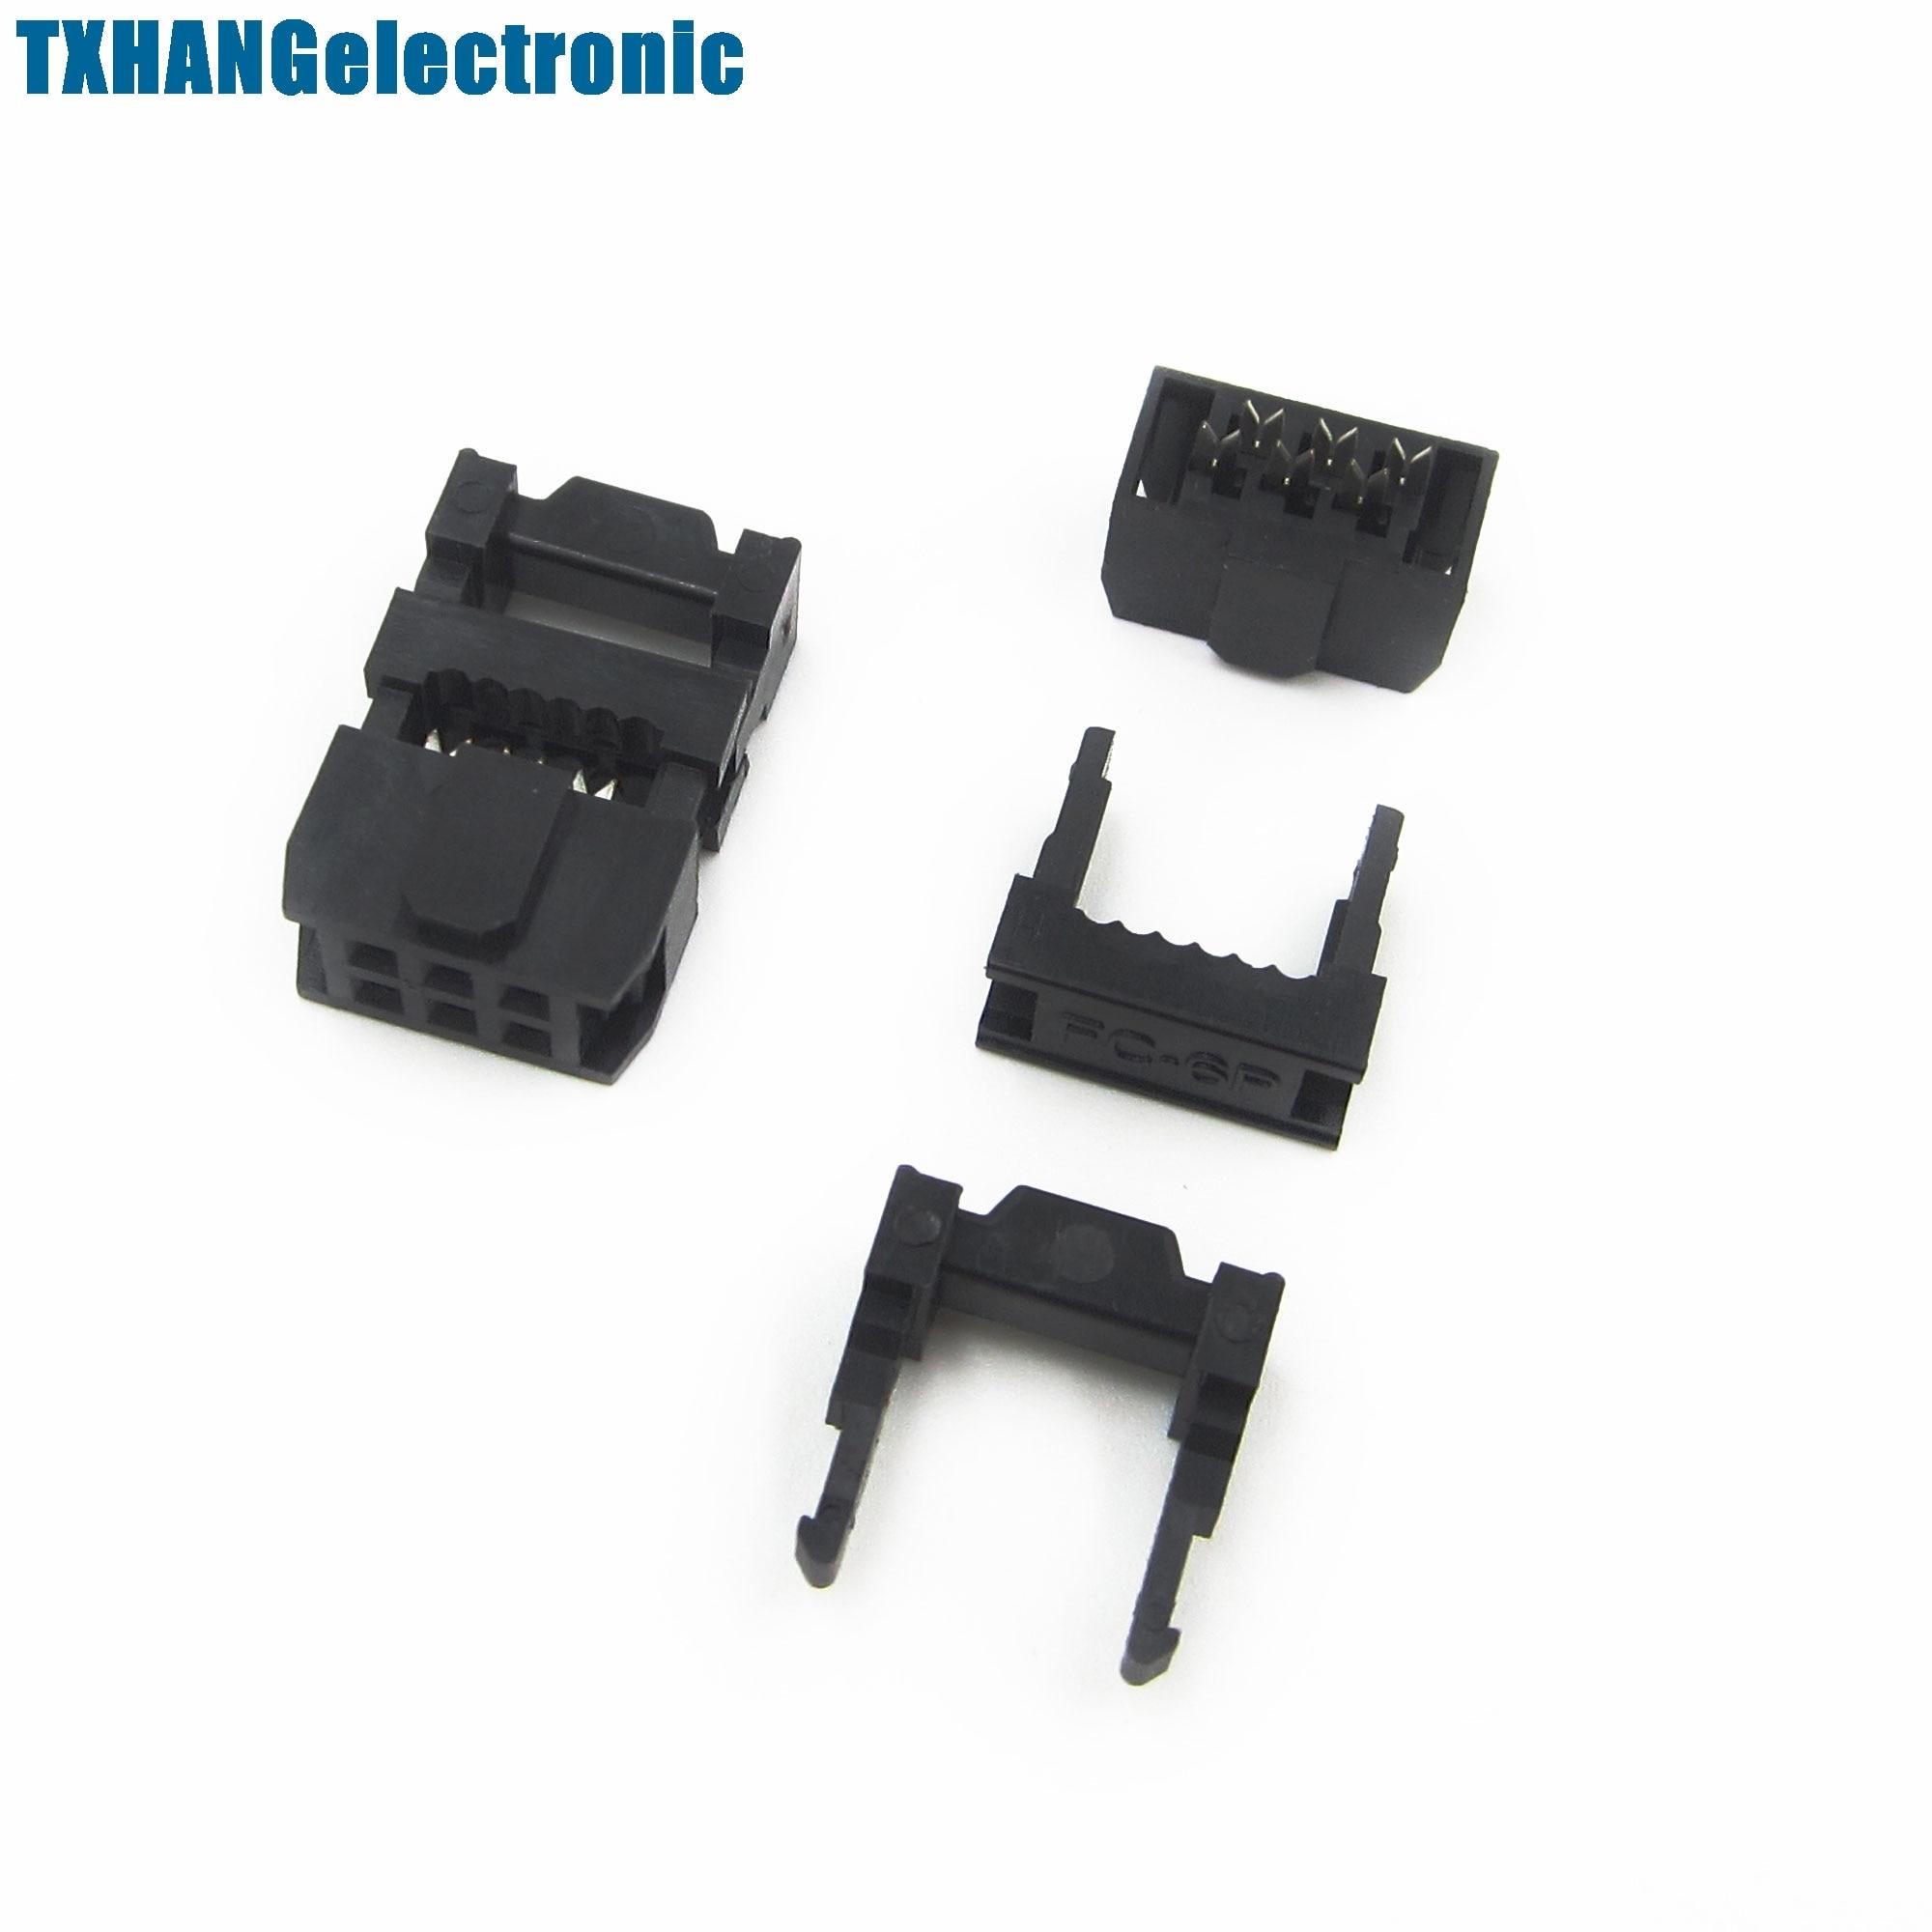 50PCS 2.54mm Pitch 6Pin FC-6P IDC FC Female Header Connector 3pcs//set